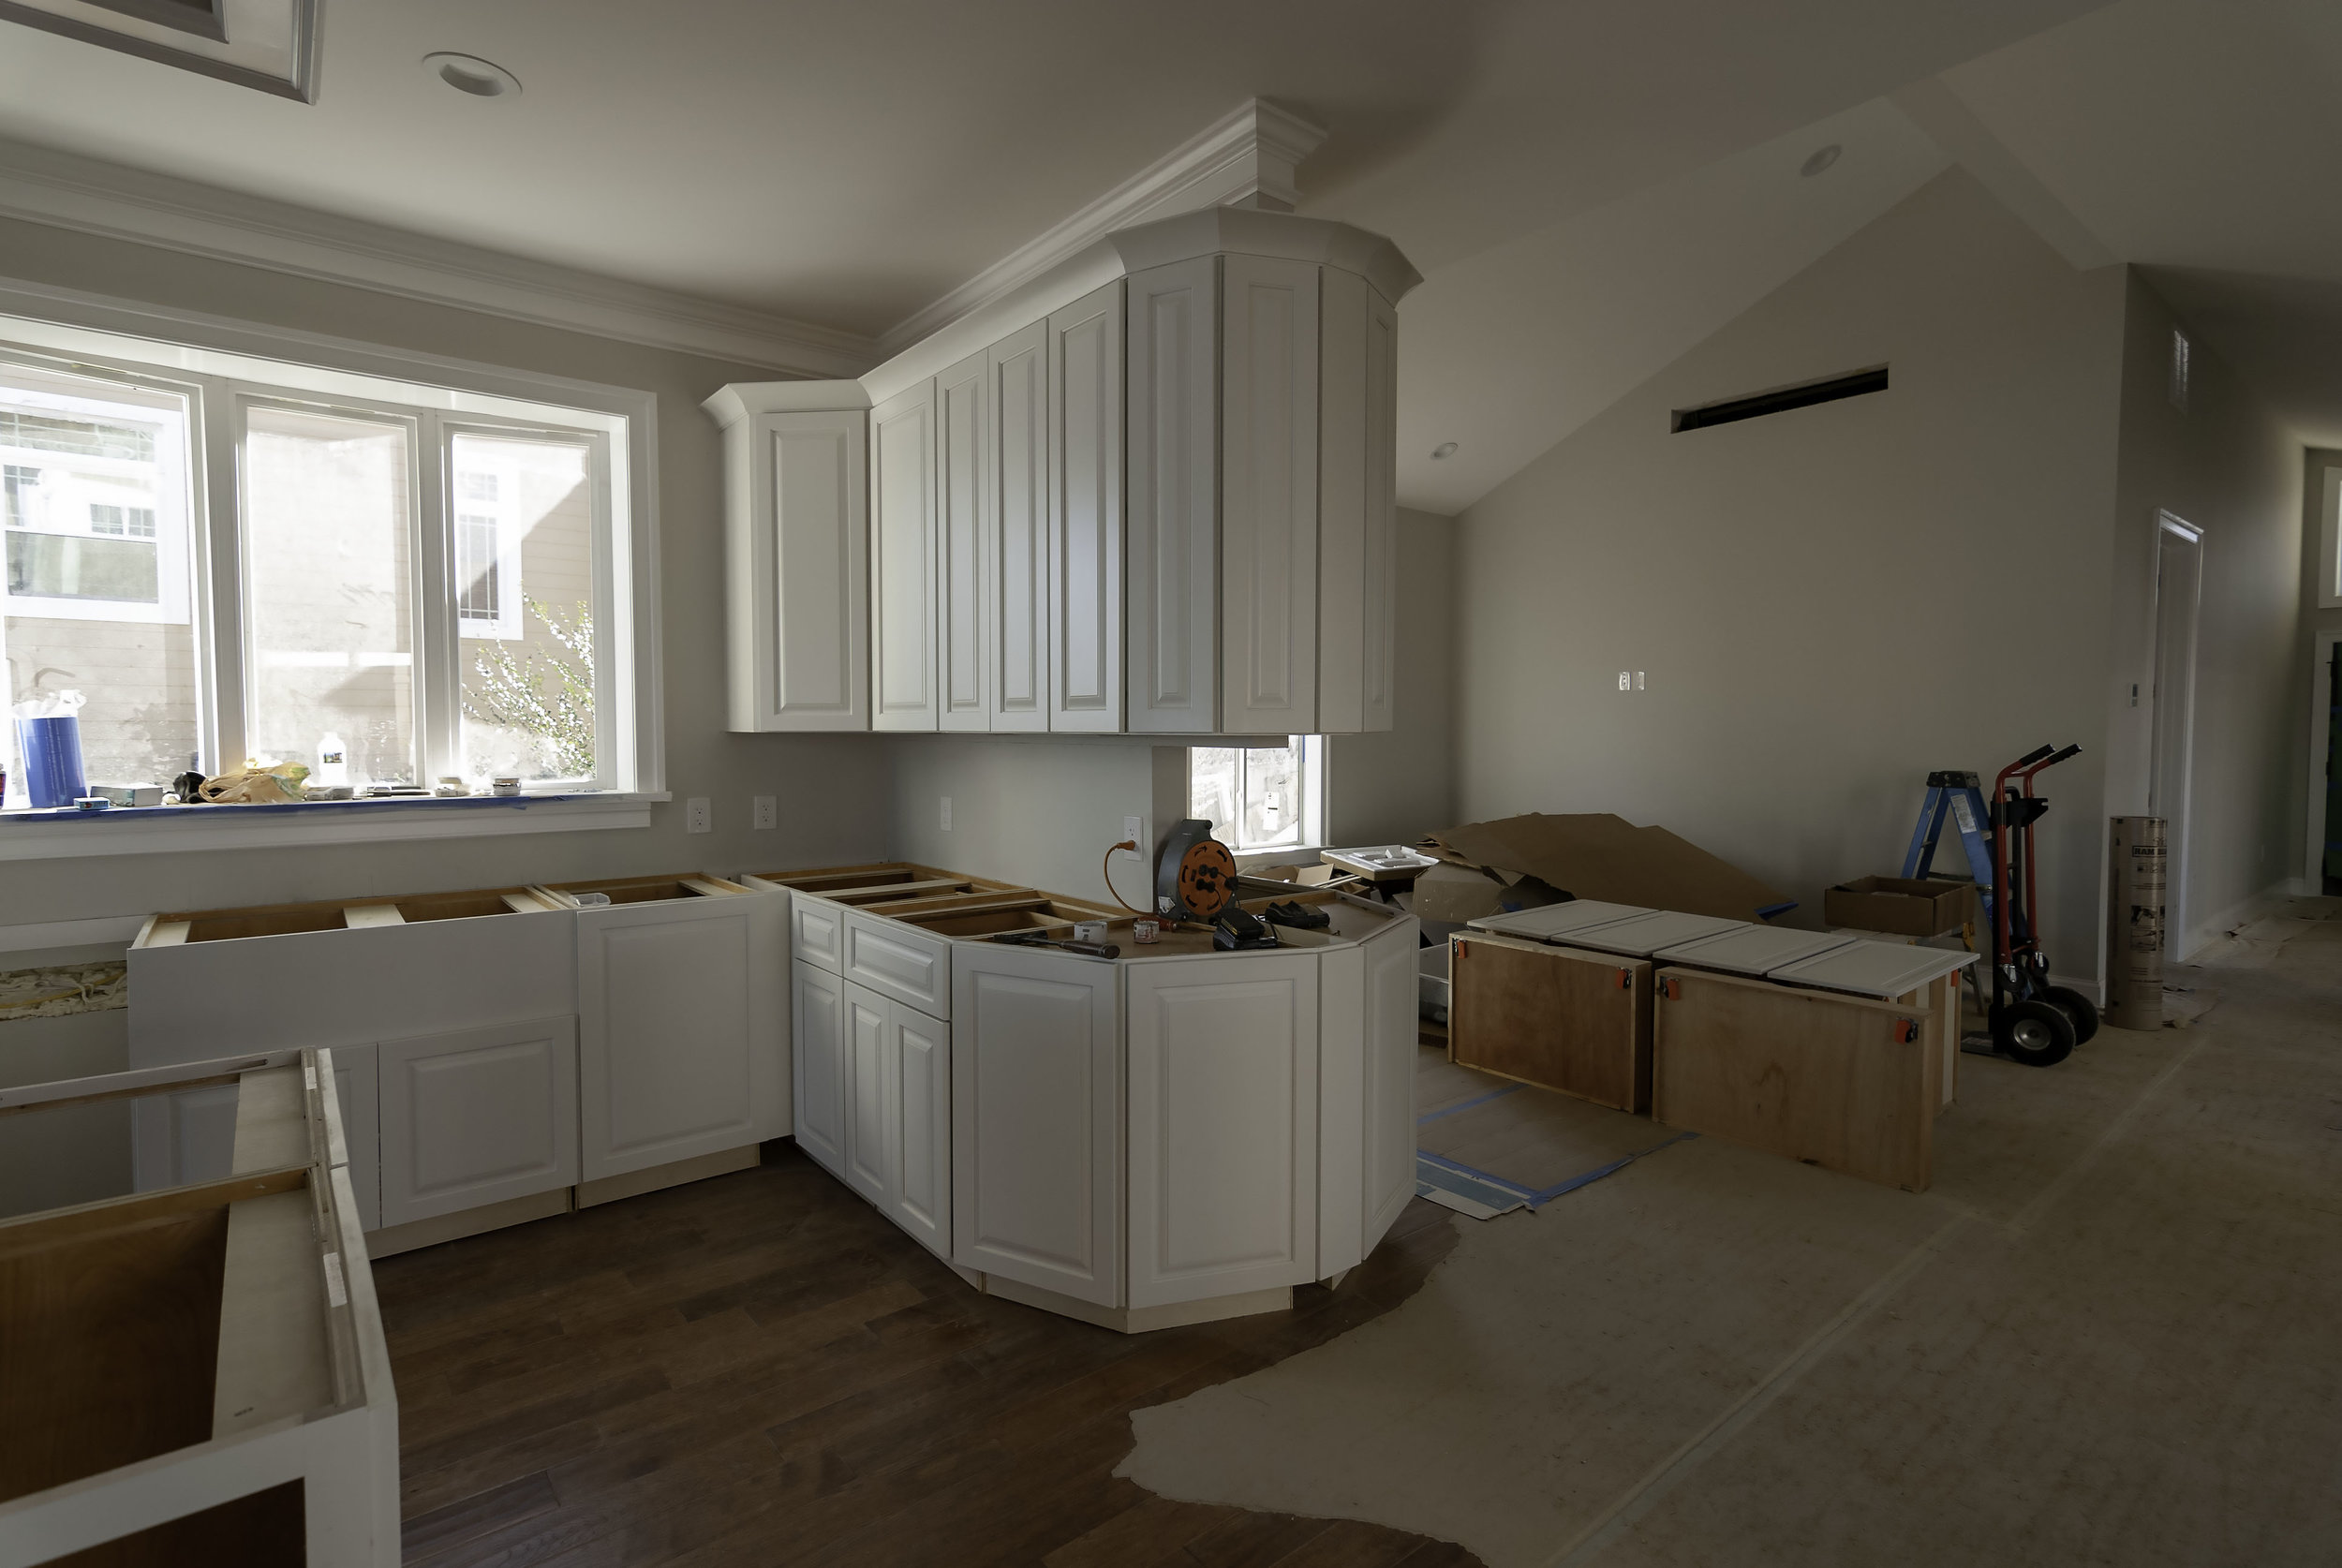 Riverhouse kitchen cabinets.jpg